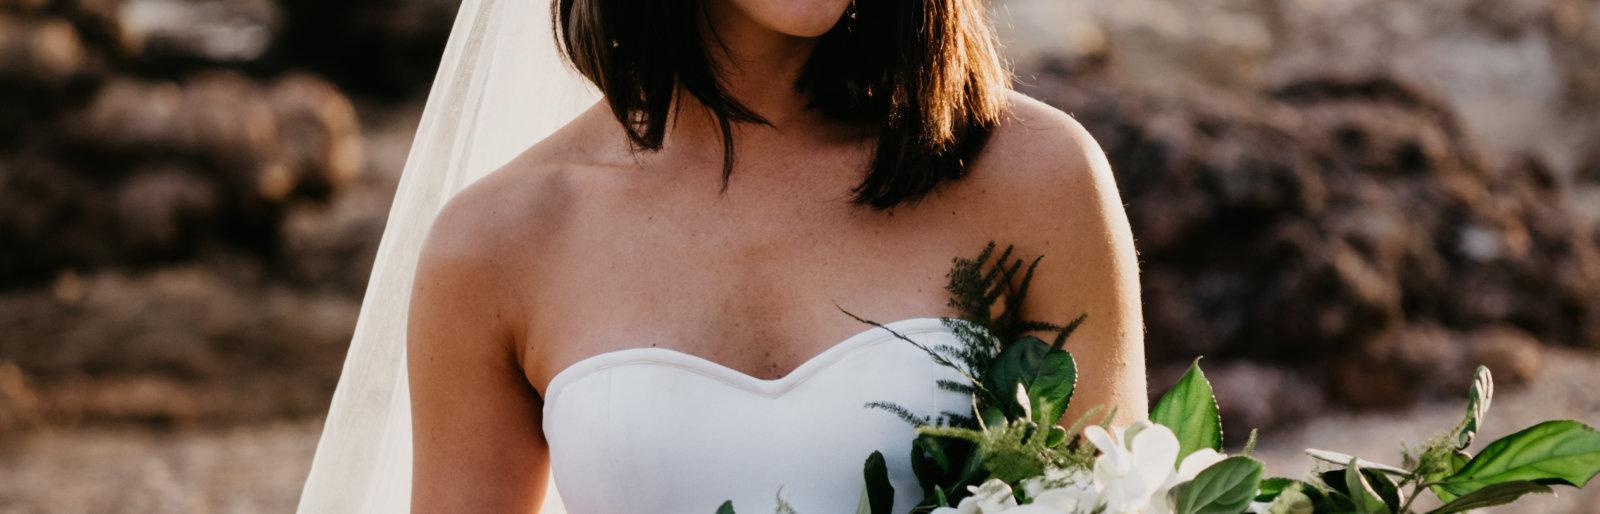 Ane Kirsten Ferreira